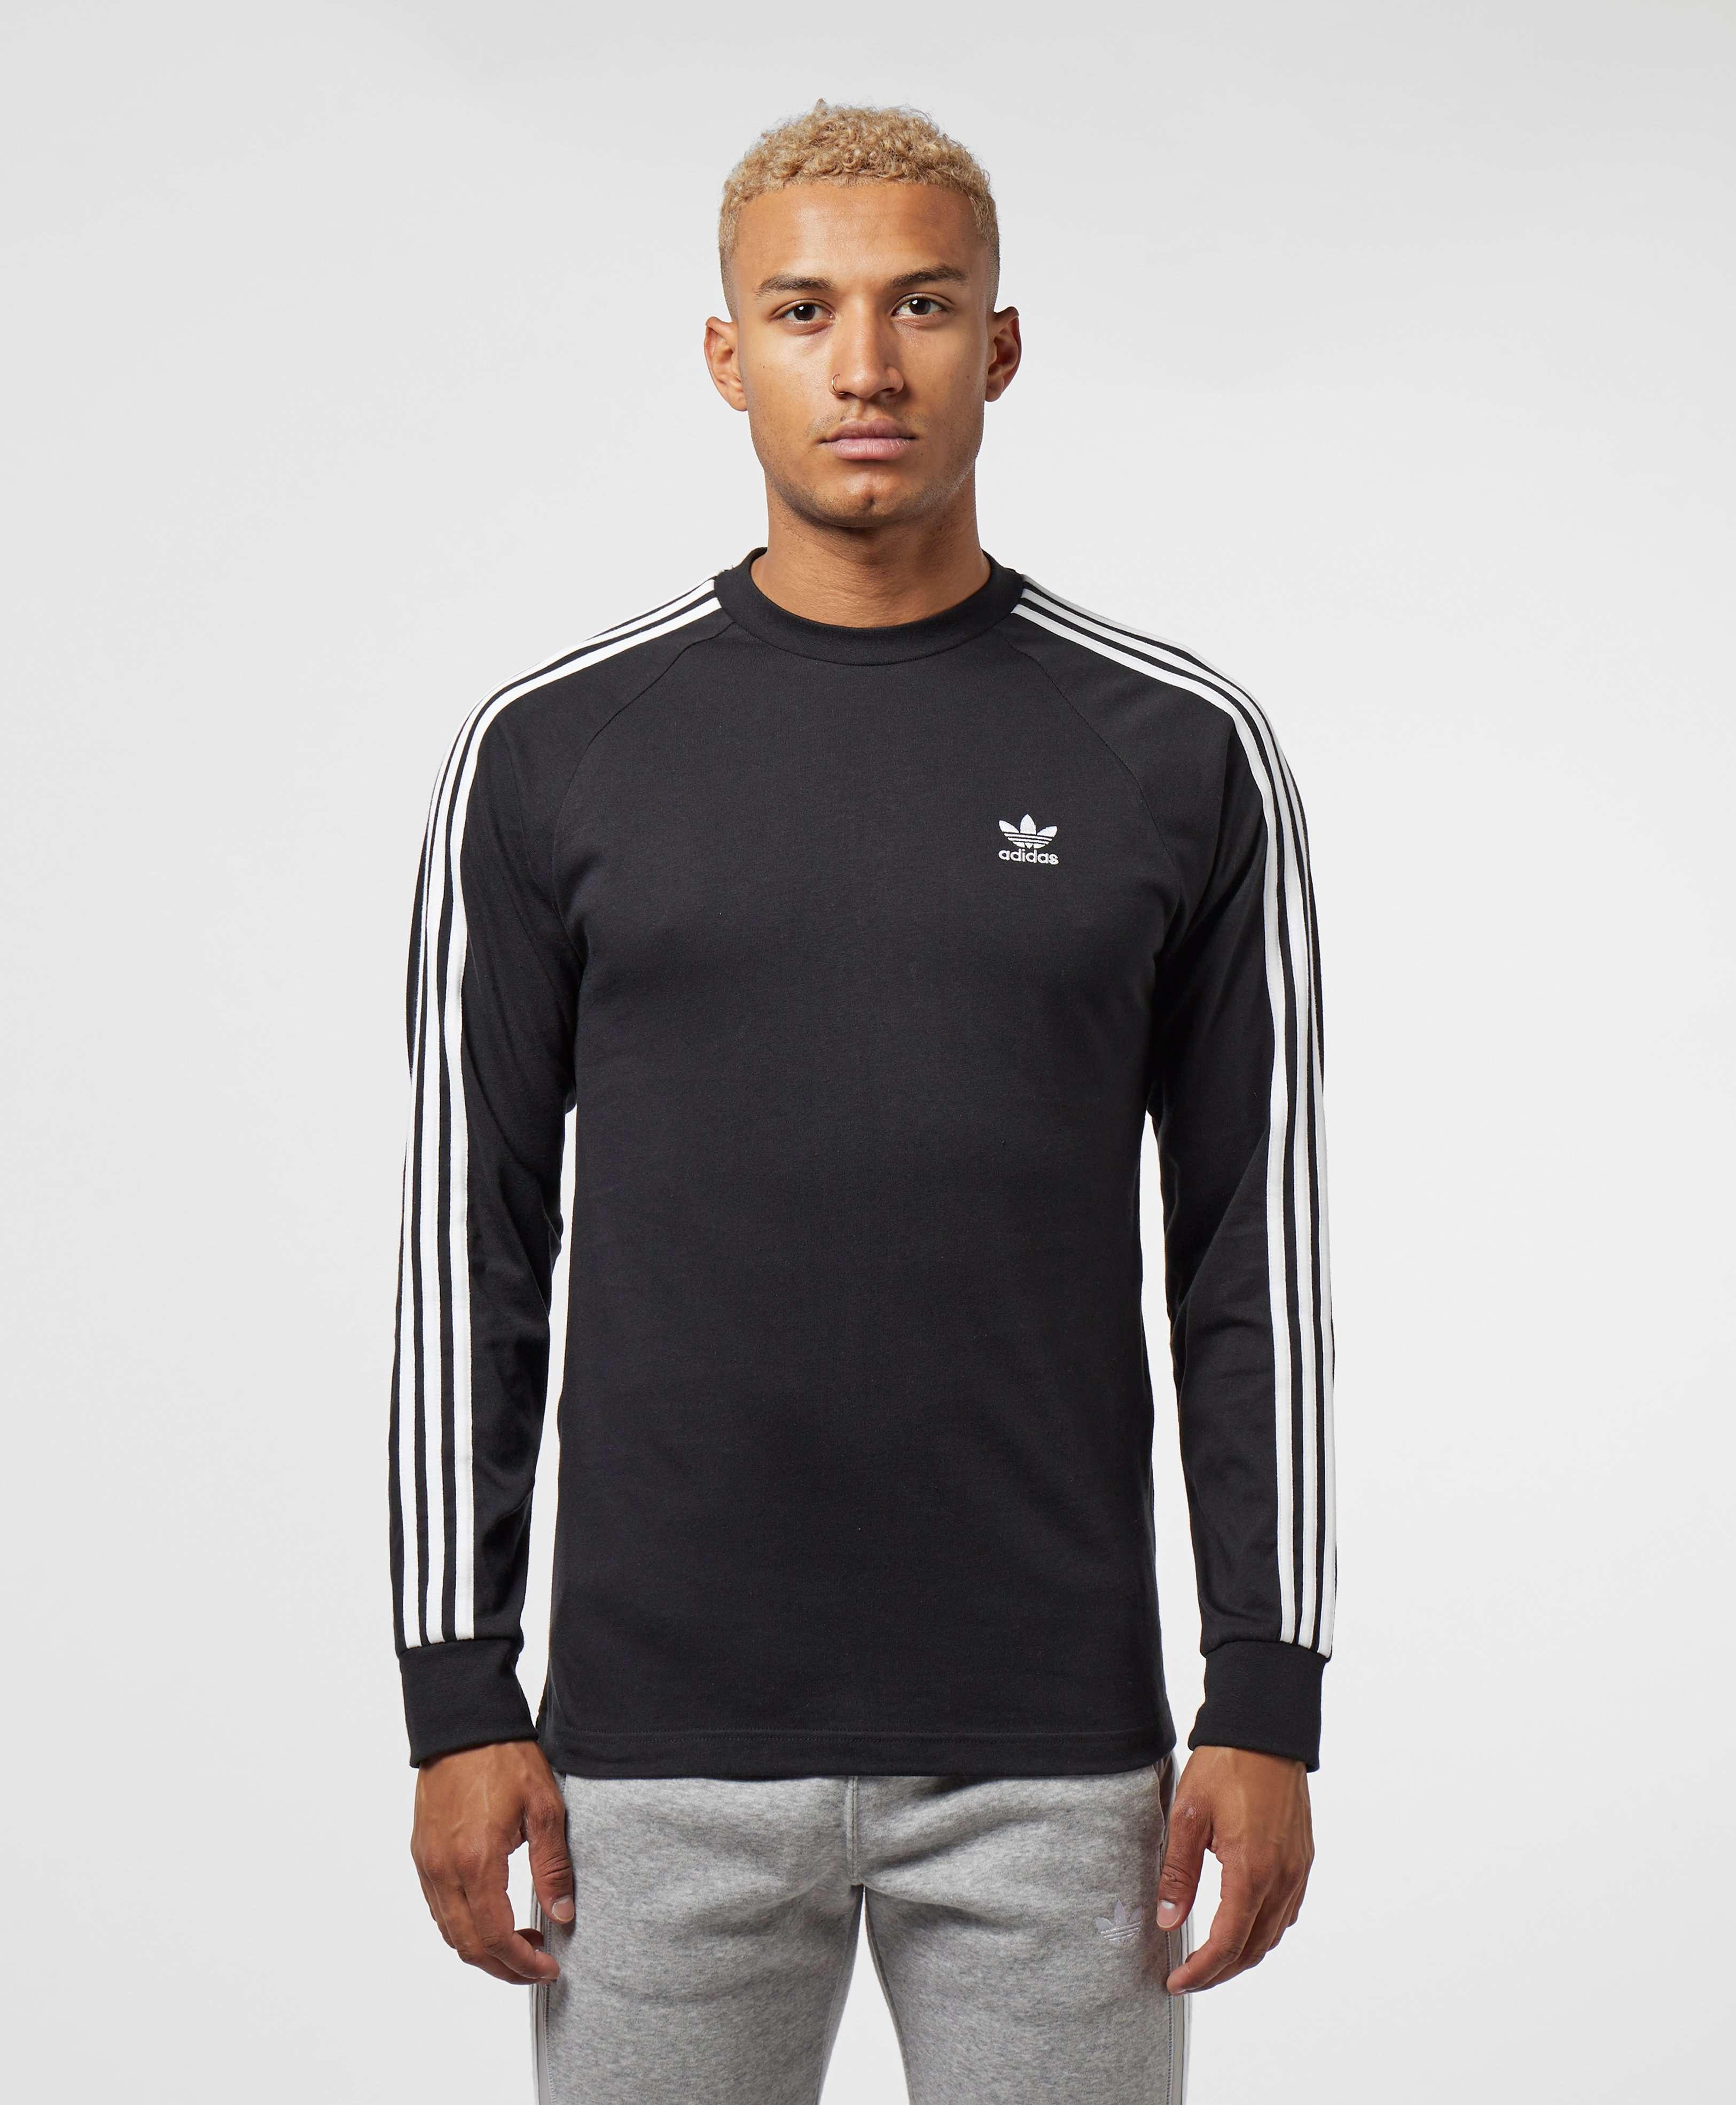 adidas Originals California Long Sleeve T-Shirt | scotts ...